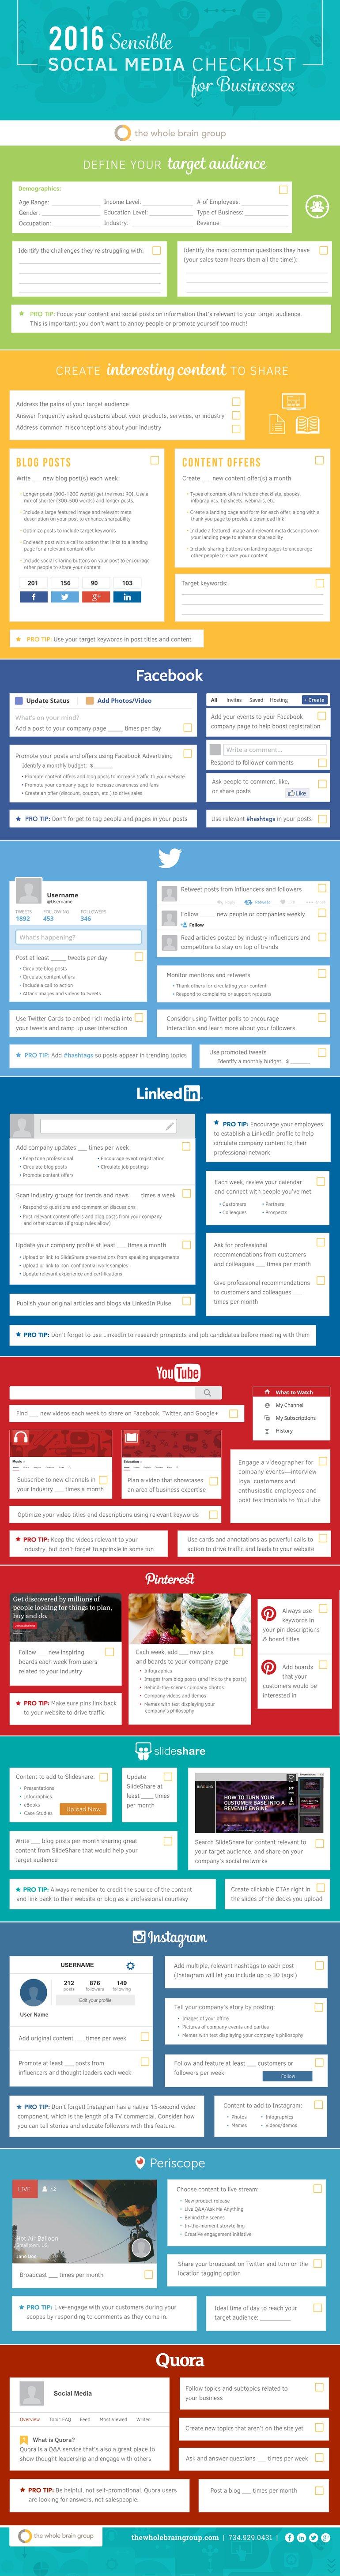 WBG_Social_Media_Checklist_2016.png